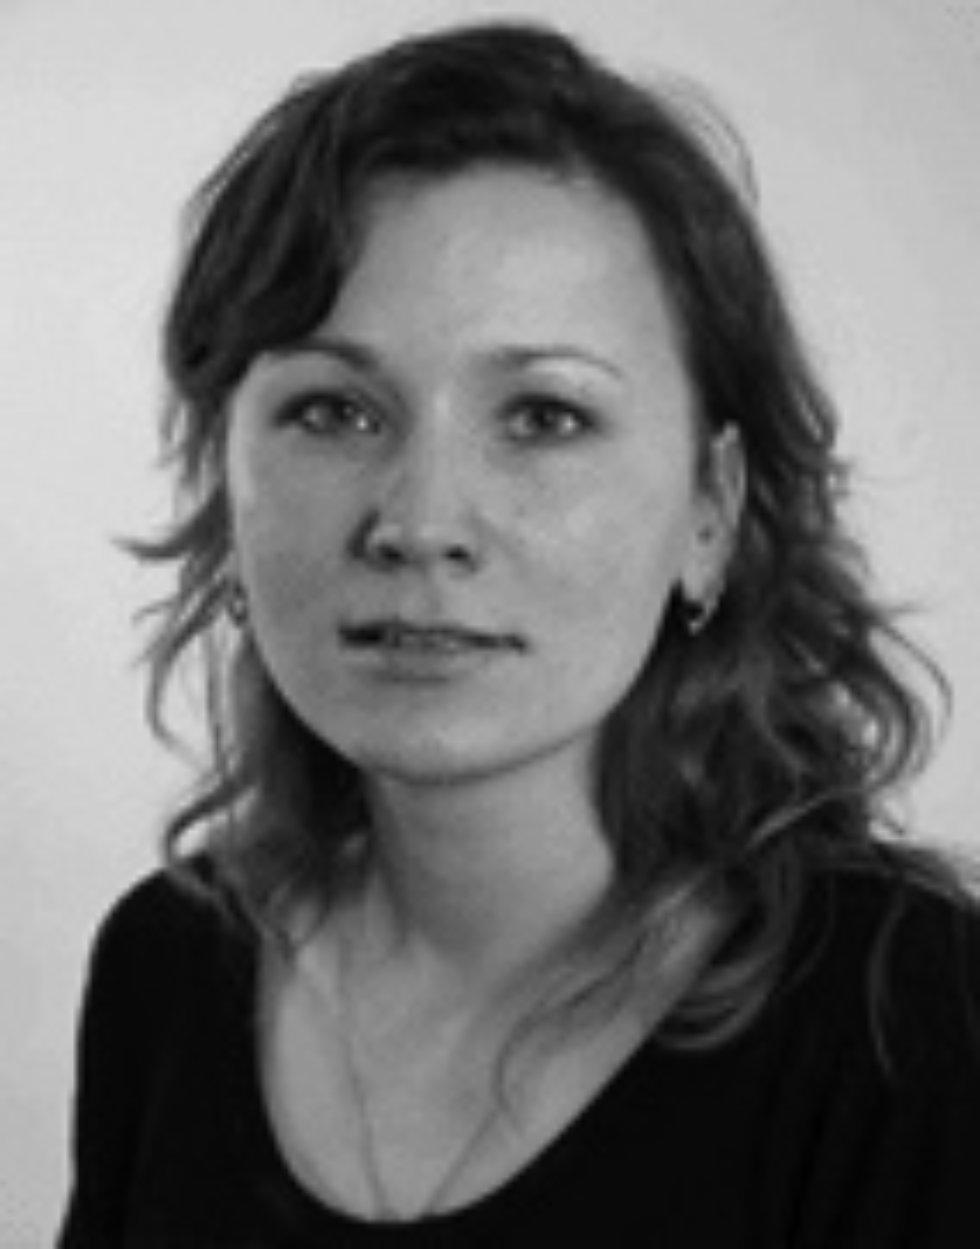 Sharafutdinova Natalya Sergeevna